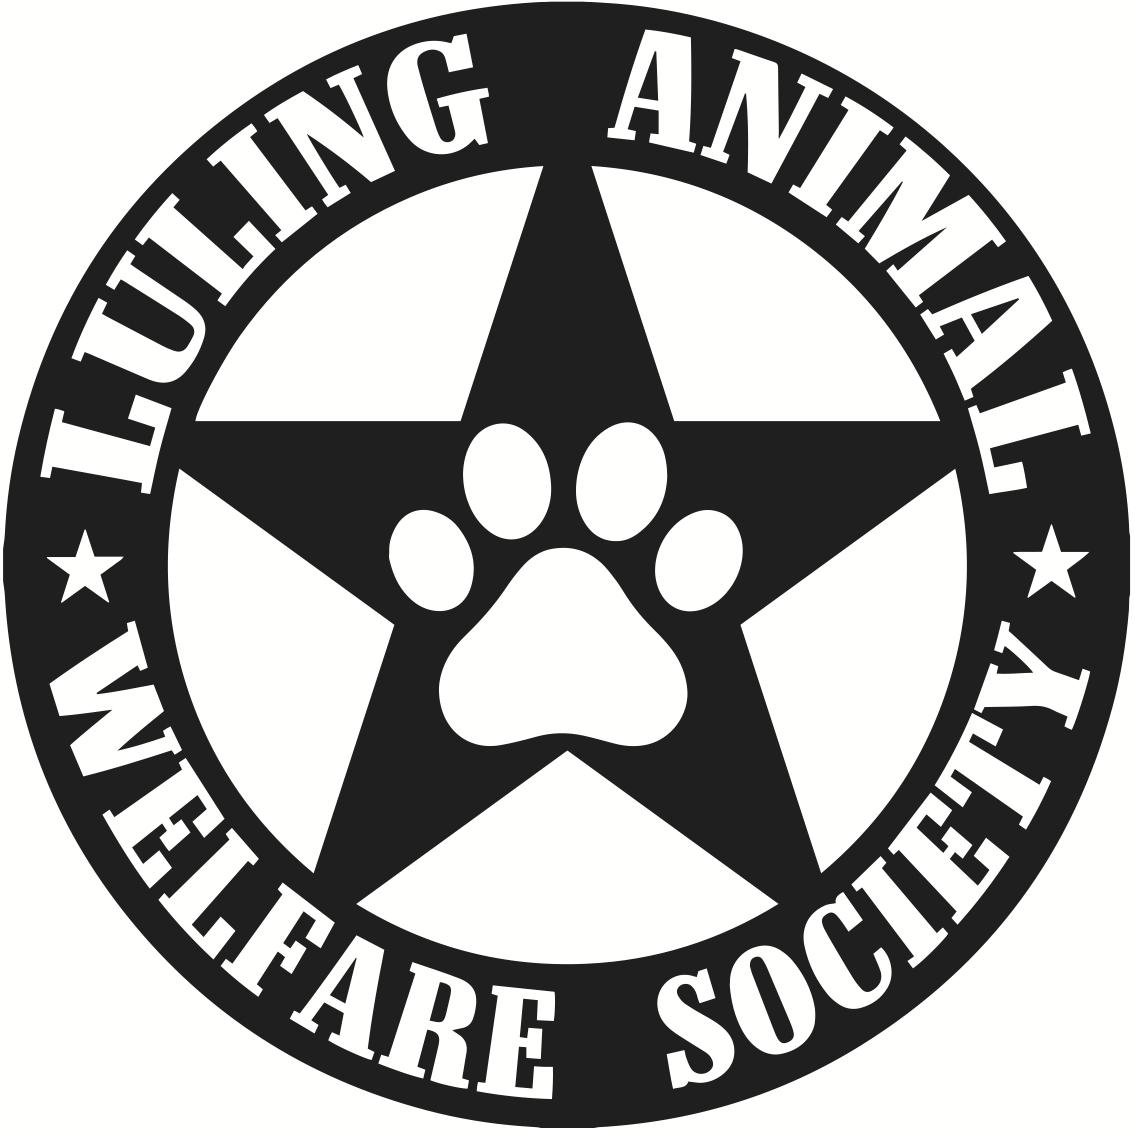 Luling Animal Welfare Society (L.A.W.S.)